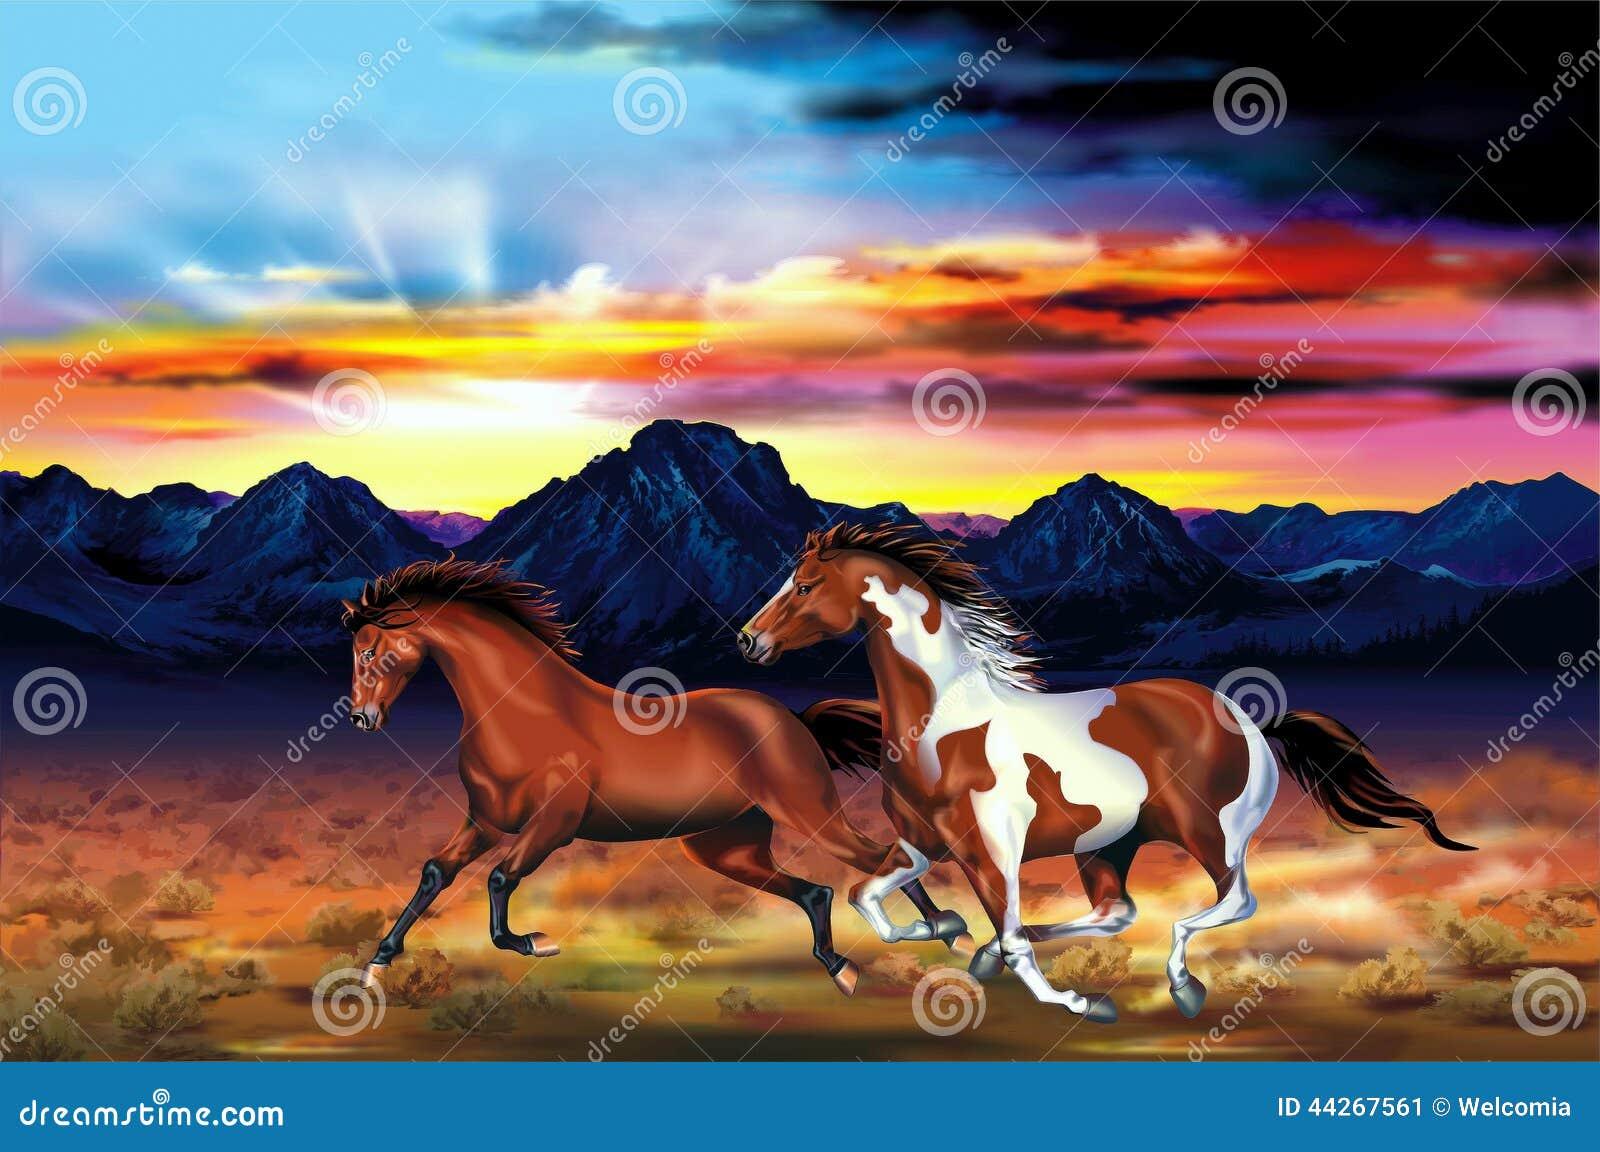 Wild Horses Run Illustration Stock Illustration Illustration Of Running Spirit 44267561